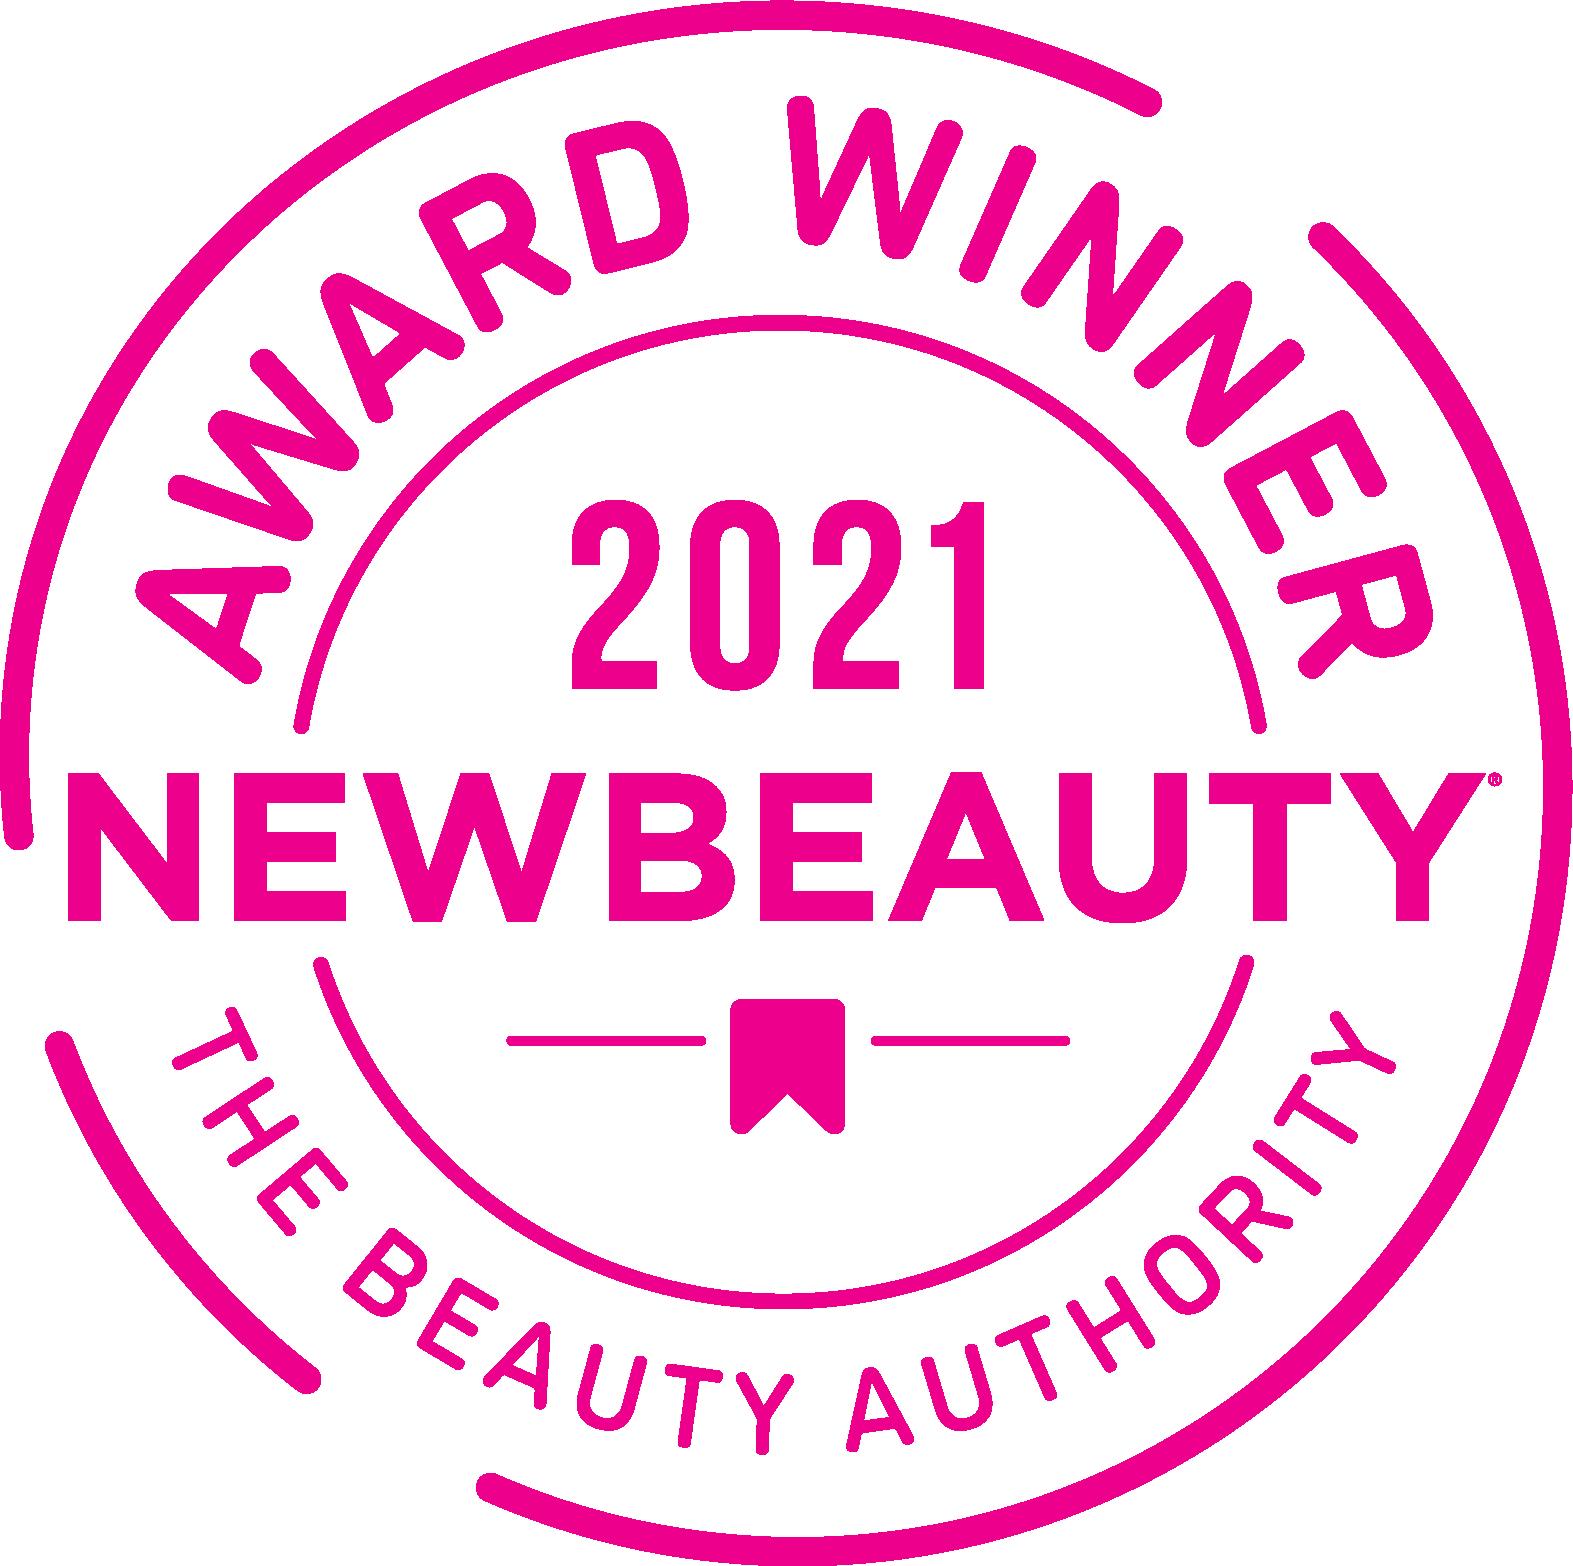 award: newbeauty 2021